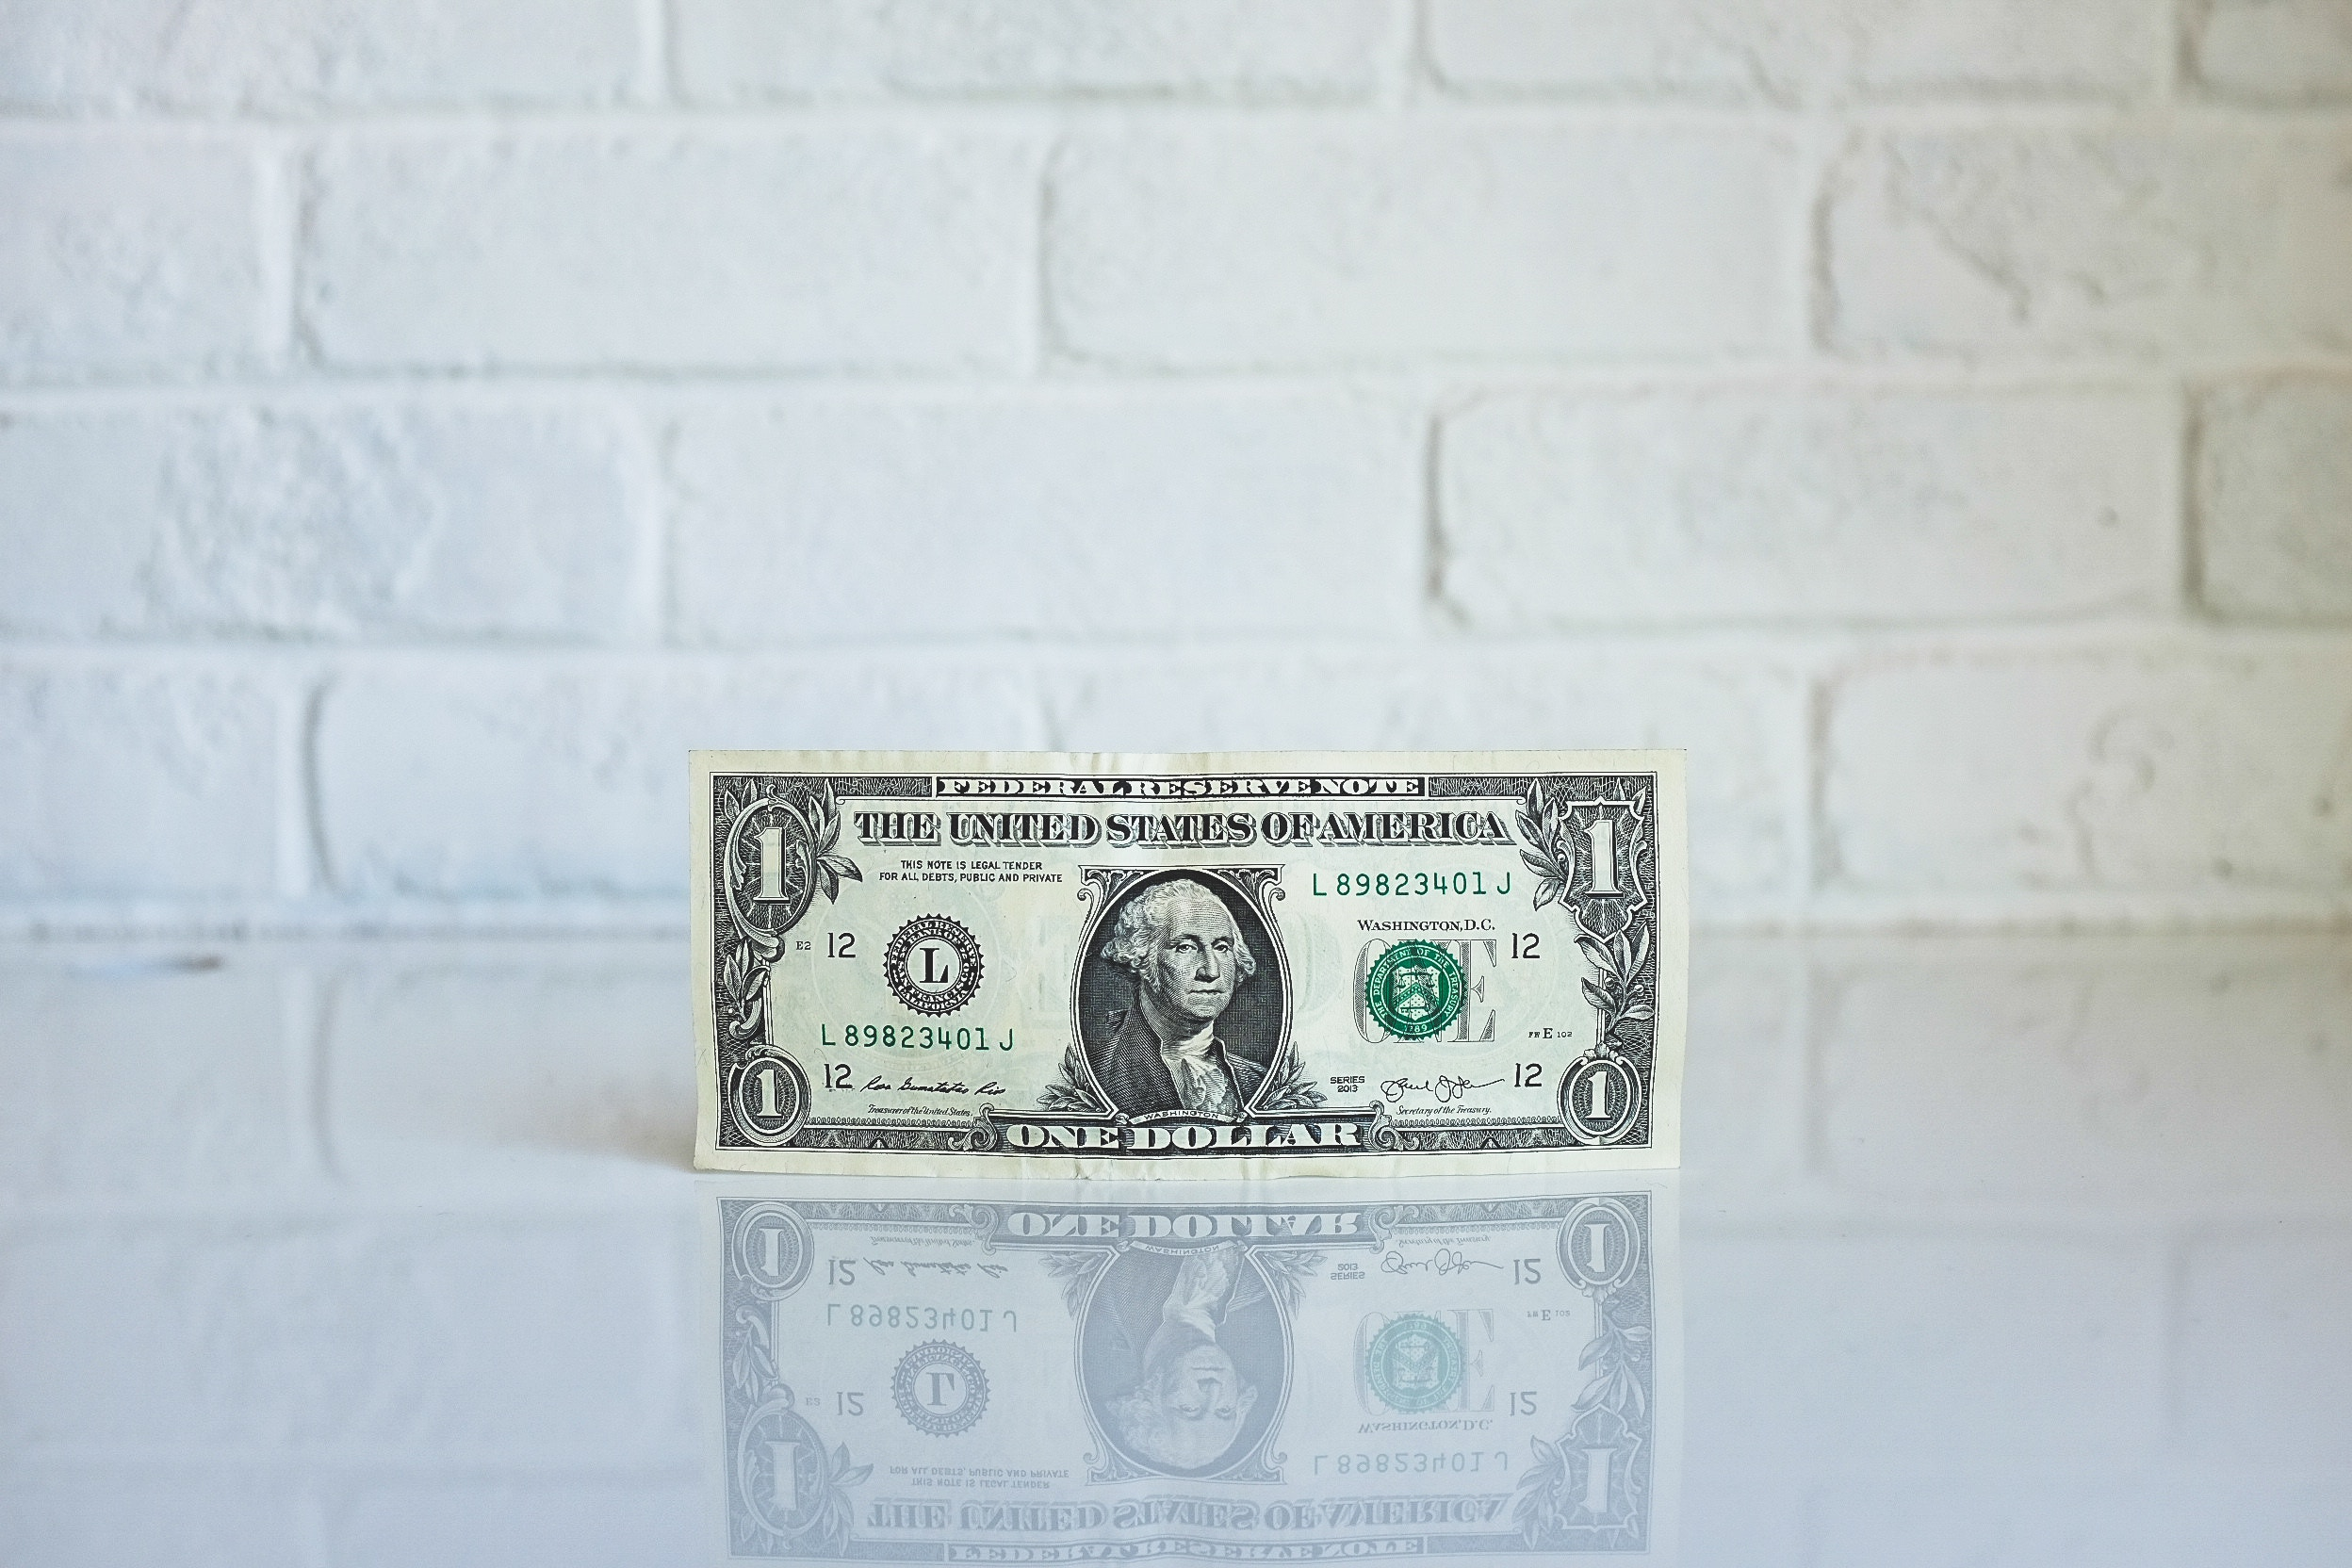 Saving Money on Customer Service with IVR